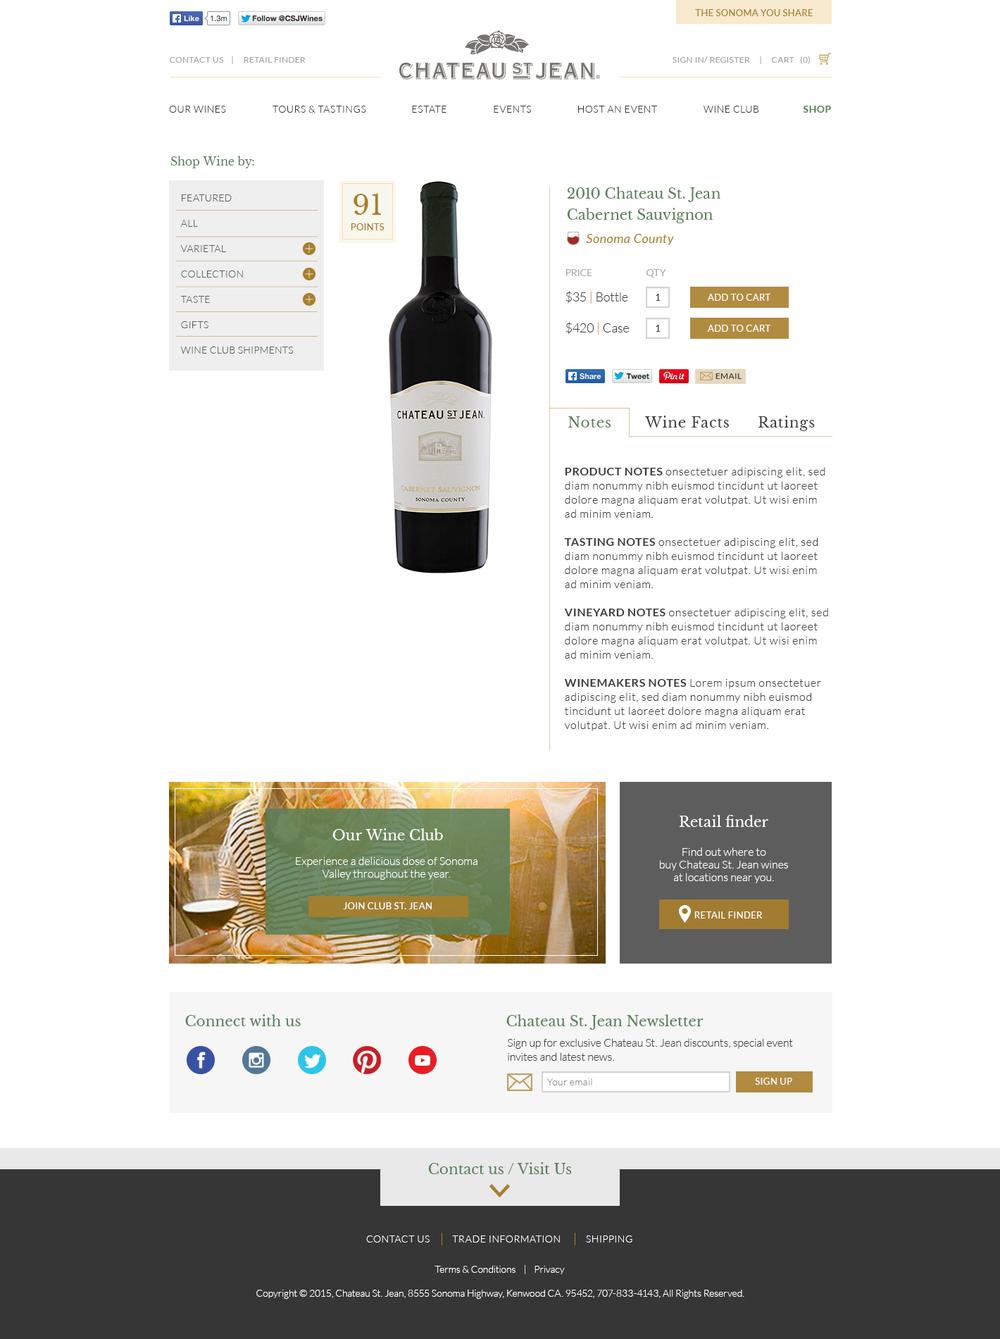 TRE01-018_CSJ-Website-Redesign_7.0Shop_7.1ProductPage.jpg